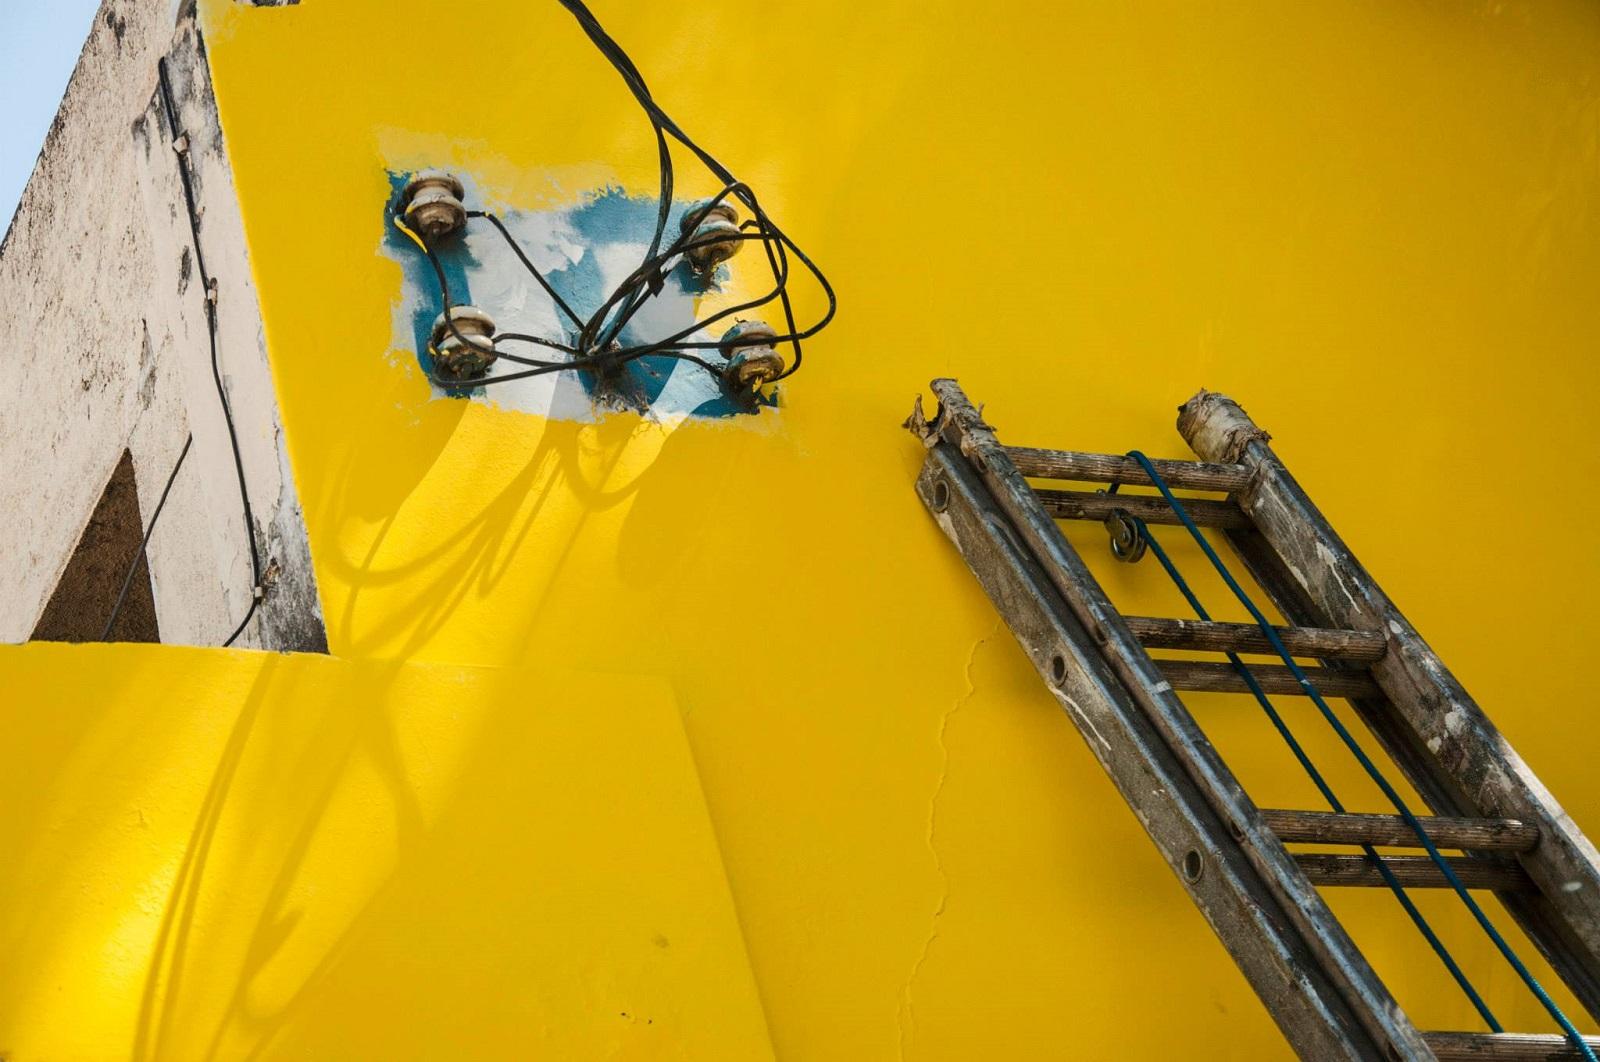 pedro-perelman-new-mural-for-oficio-residence-01